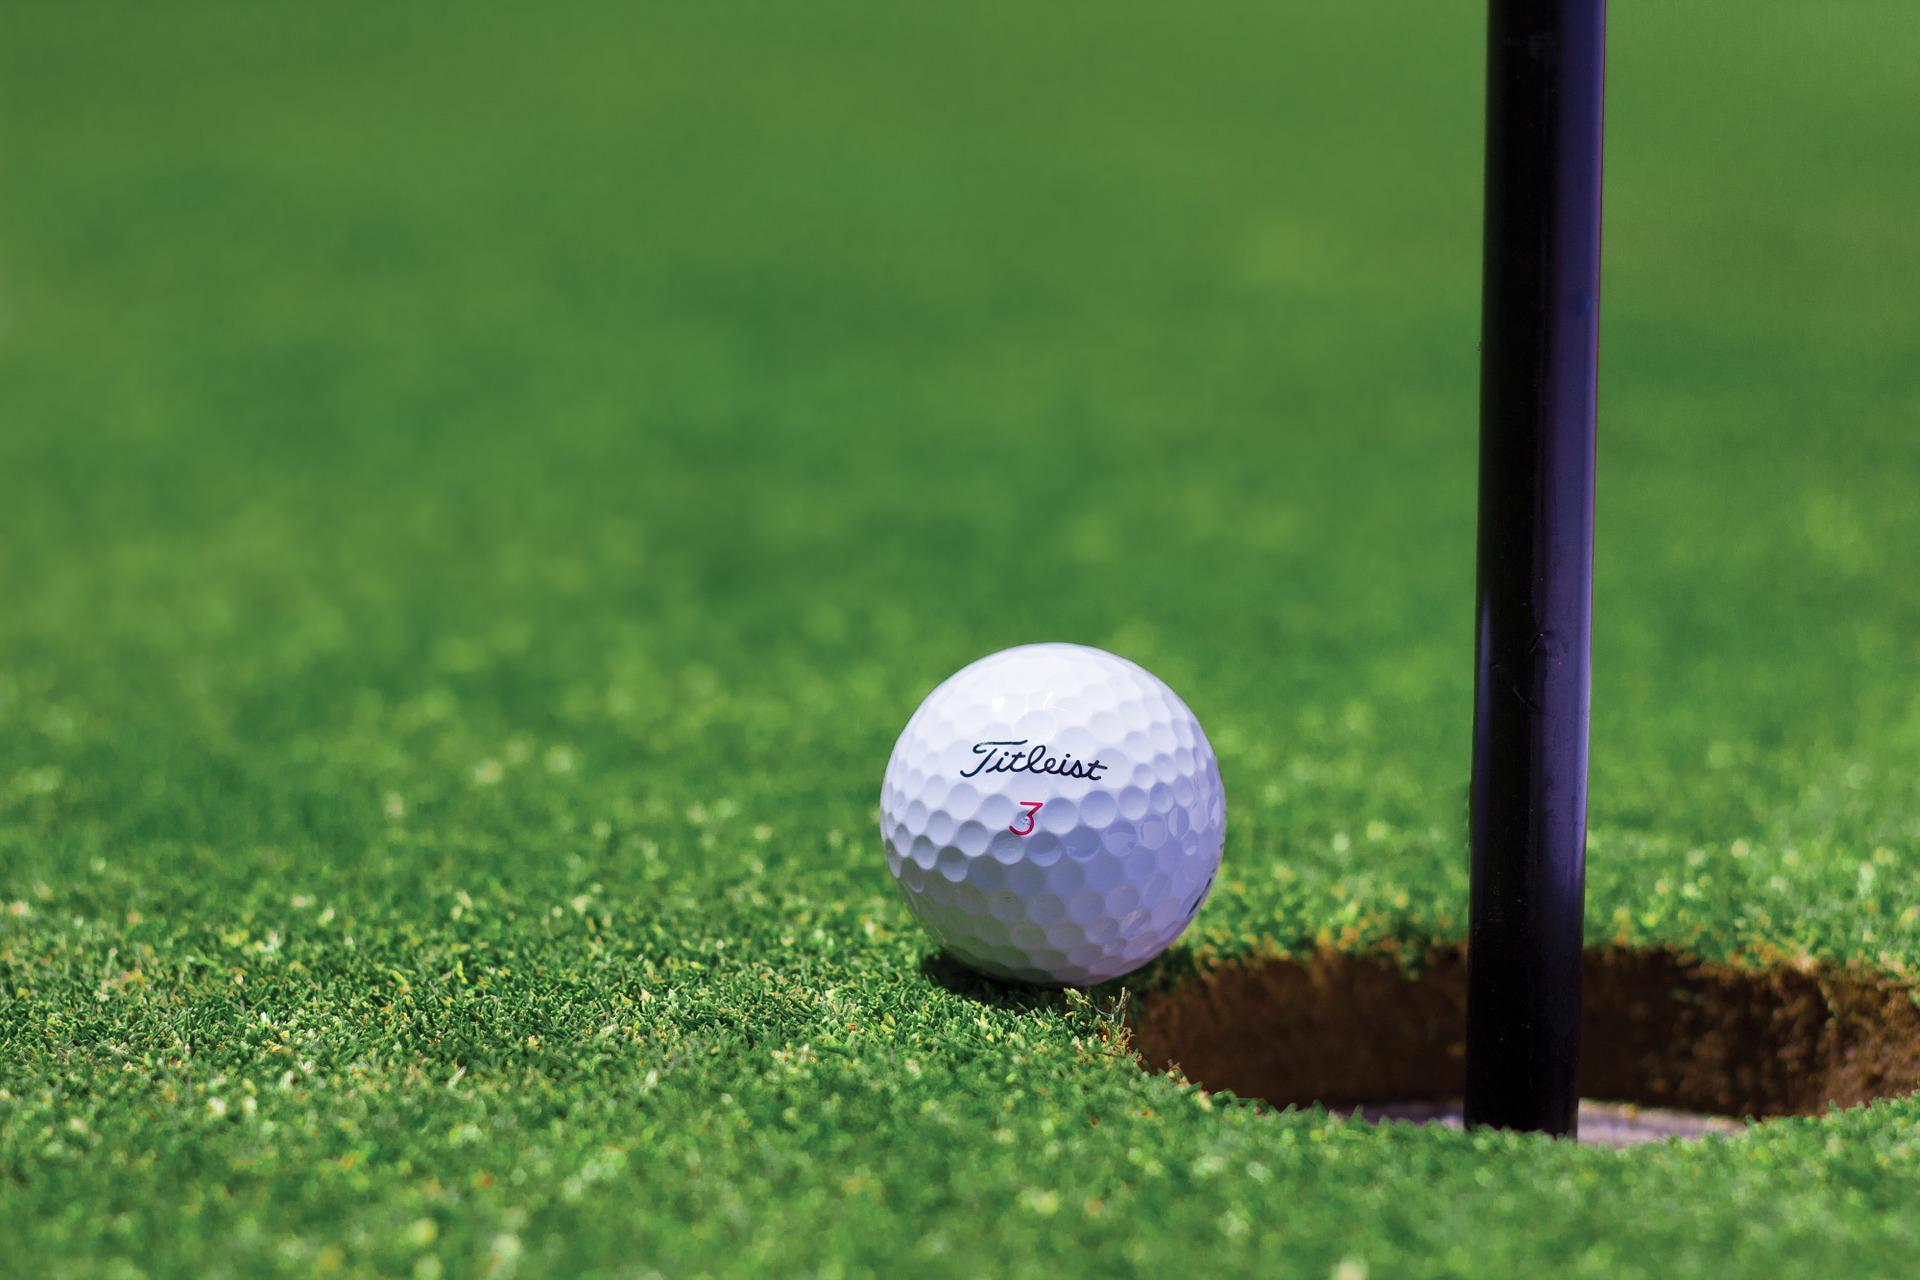 A golf ball inching towards a hole.